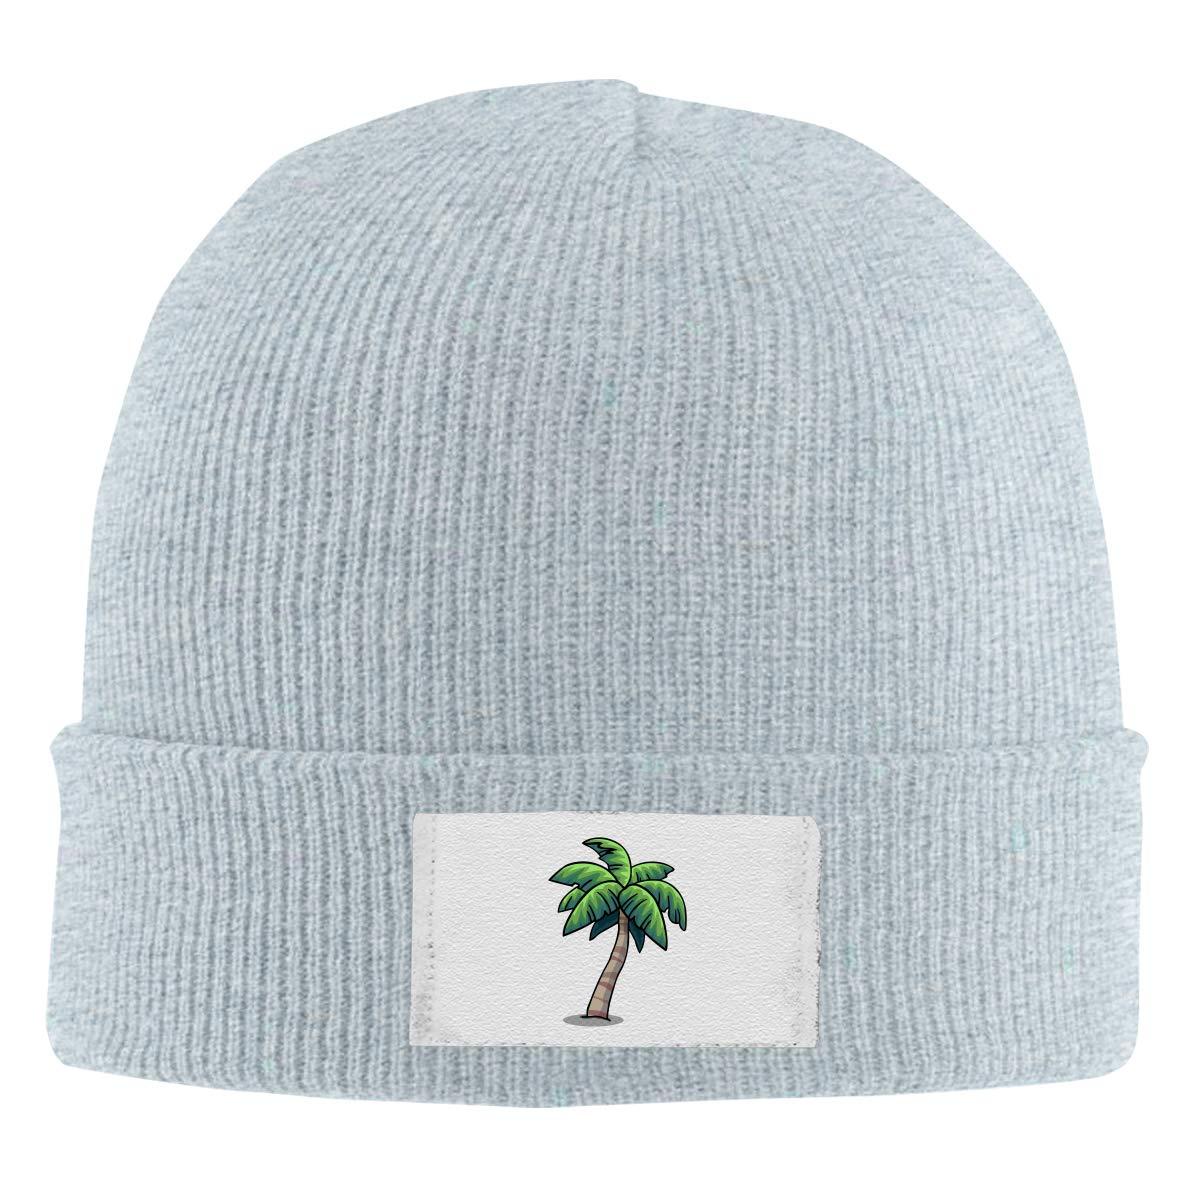 Unisex Stylish Slouch Beanie Hats Black Palm Tree Top Level Beanie Men Women